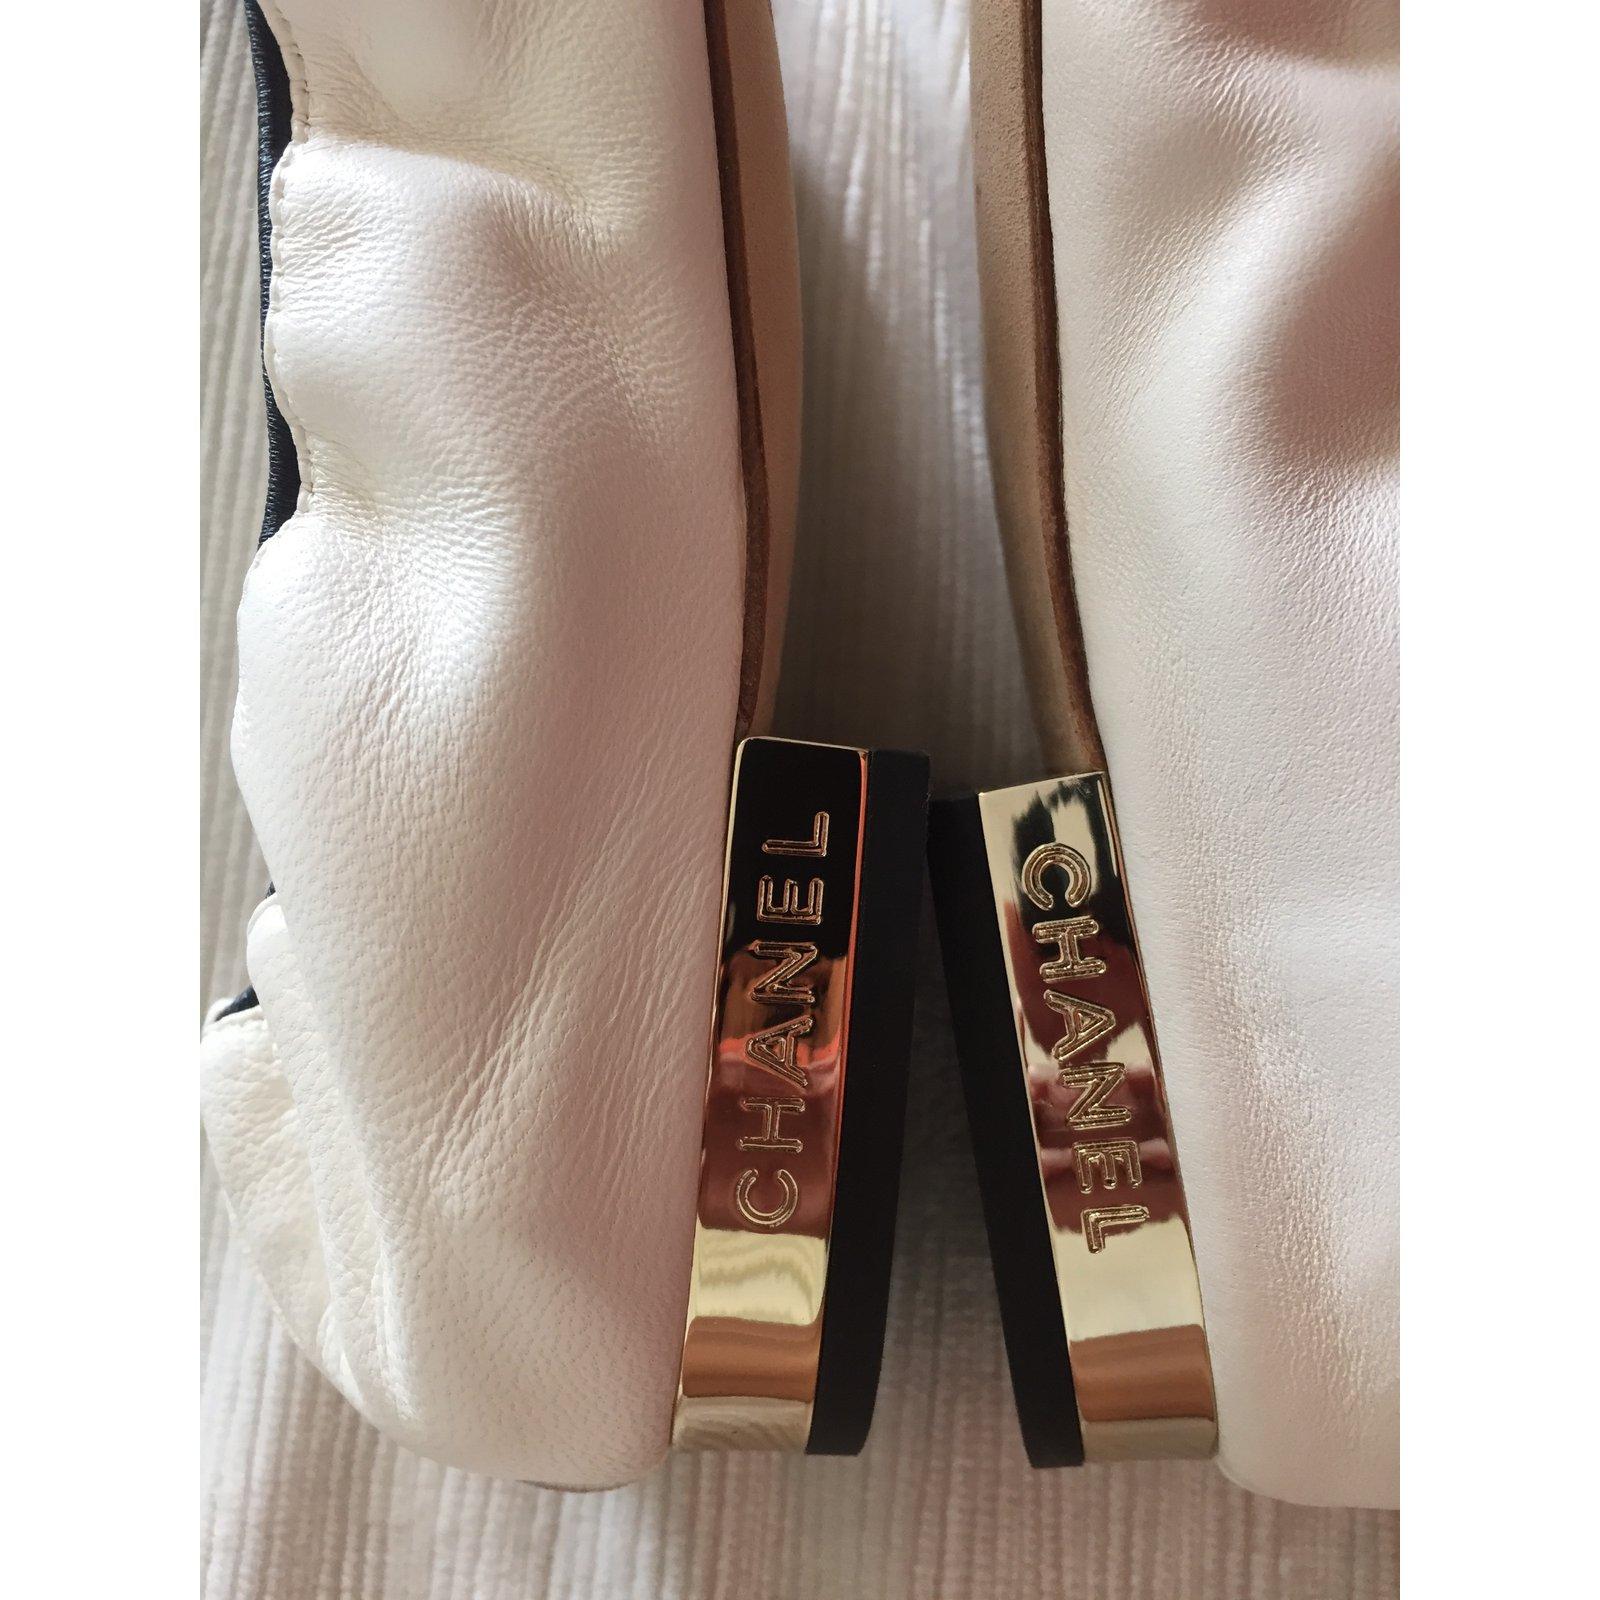 d728ff253eaa Chanel Chanel Ballerina Camélia Flats Leather White ref.23148 - Joli Closet